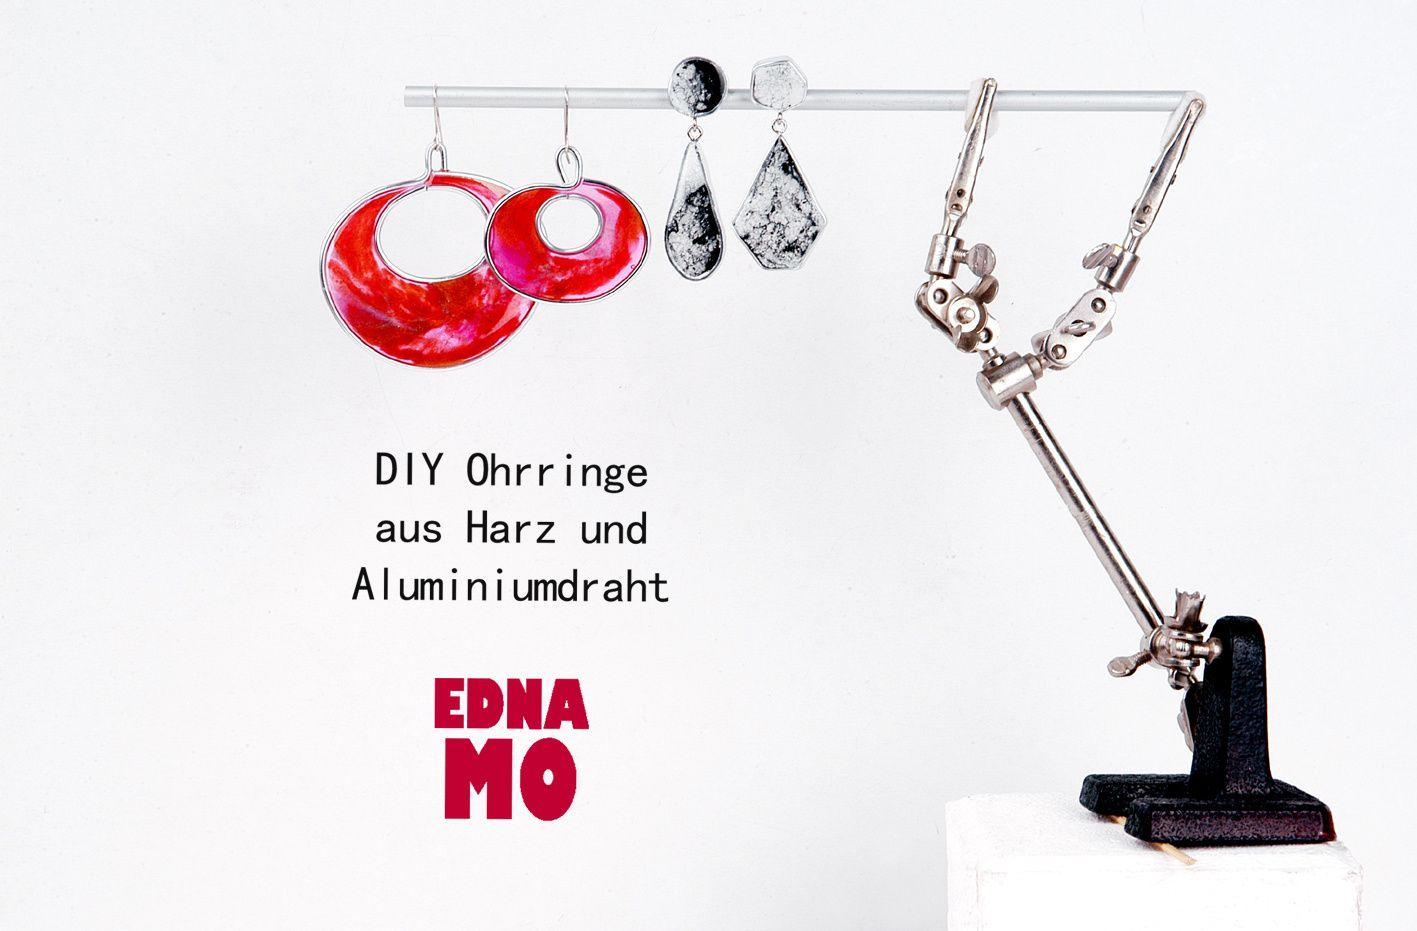 DIY Ohrringe aus Kunstharz und Aluminiumdraht_I_OHNE SILIKONFORM